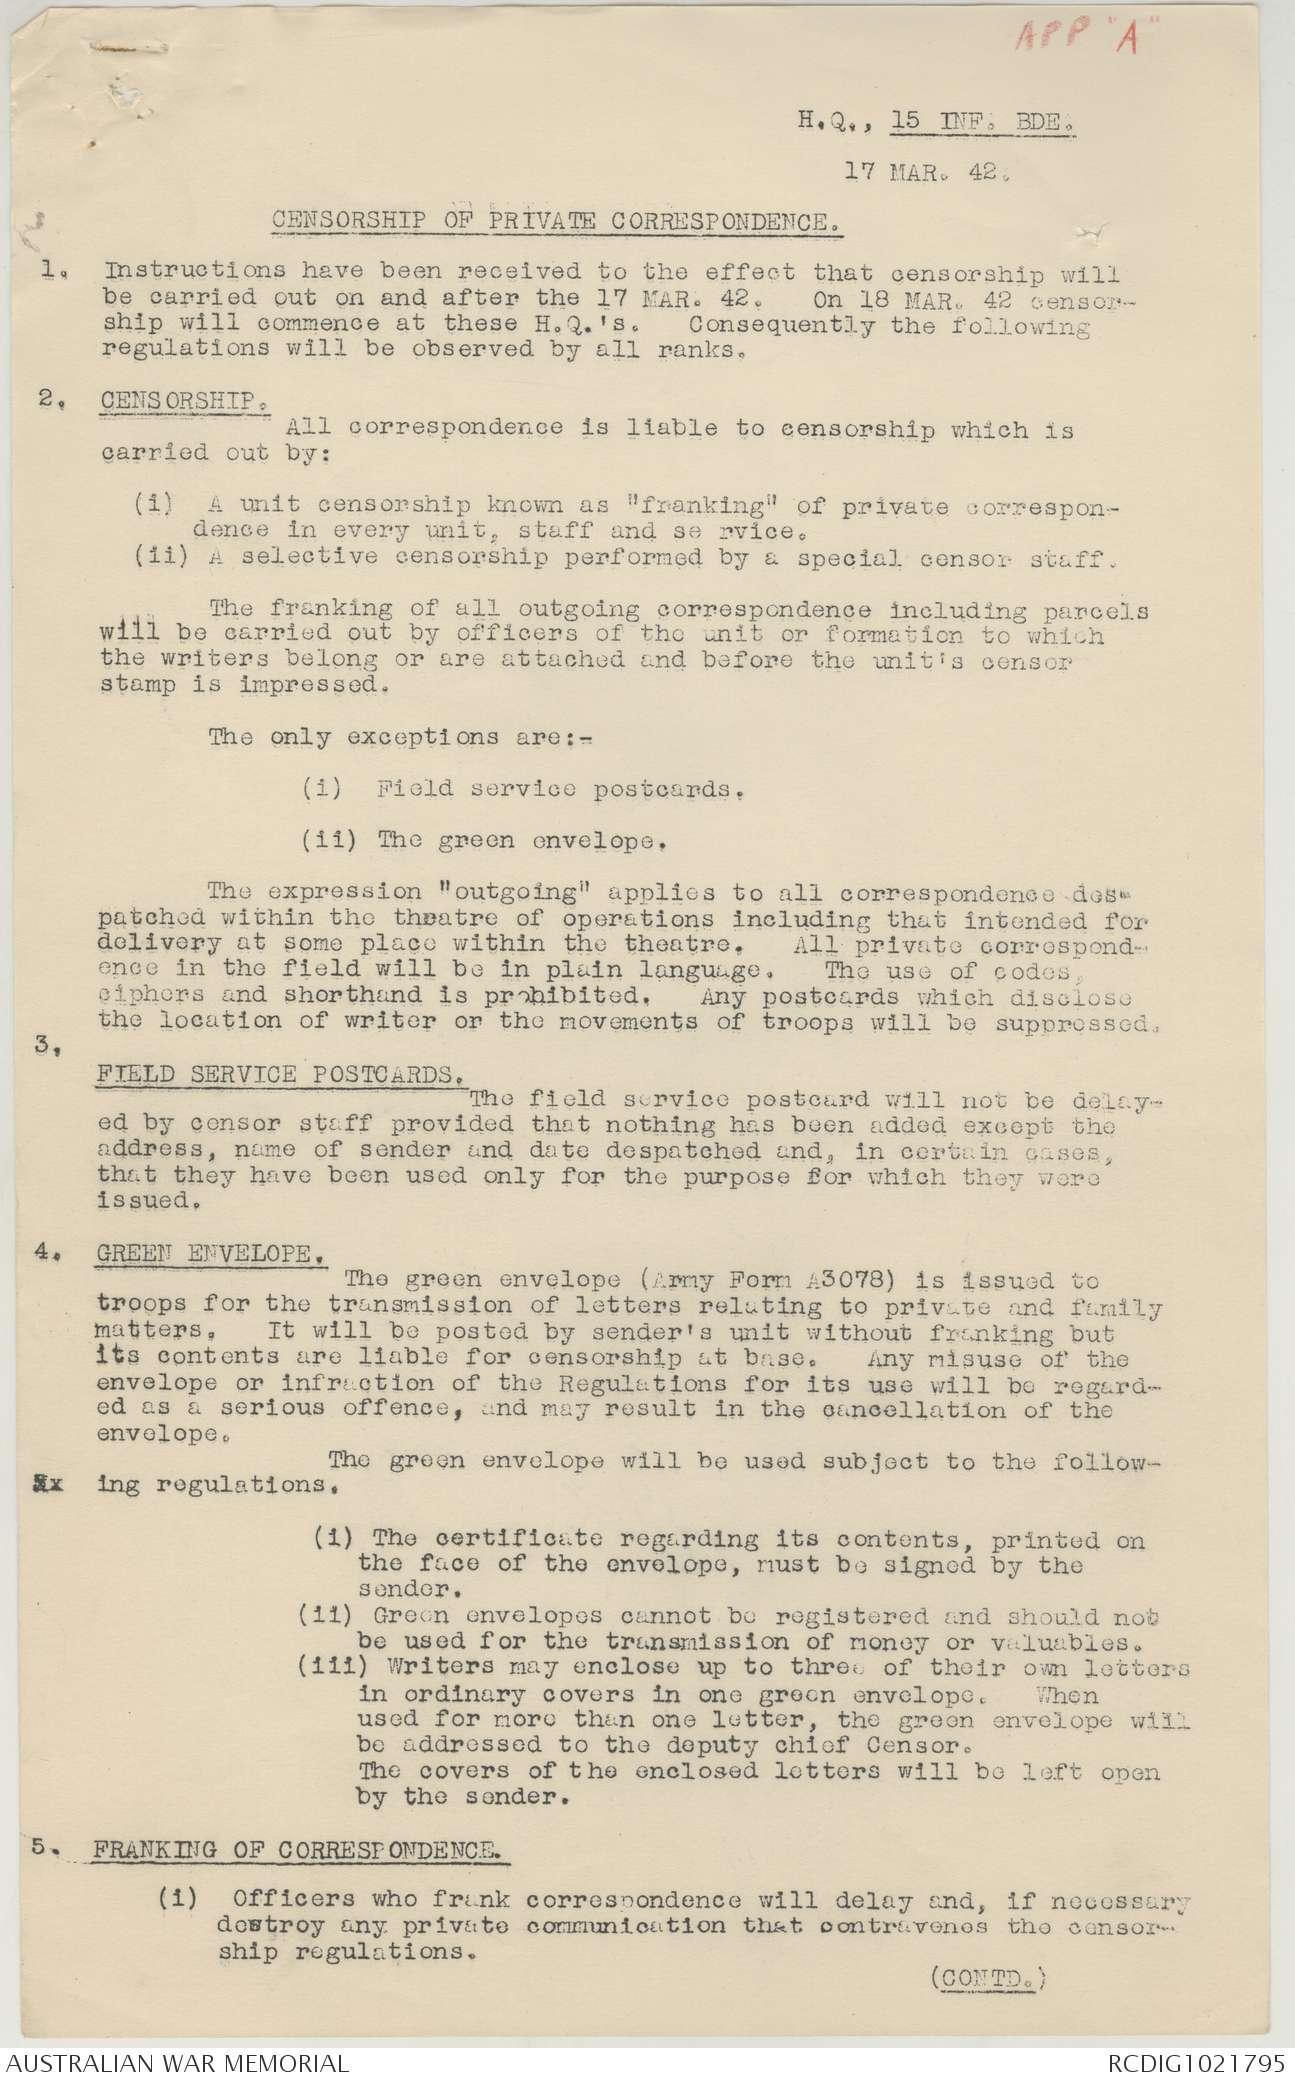 AWM52 8/2/15/3 - March - April 1942   The Australian War